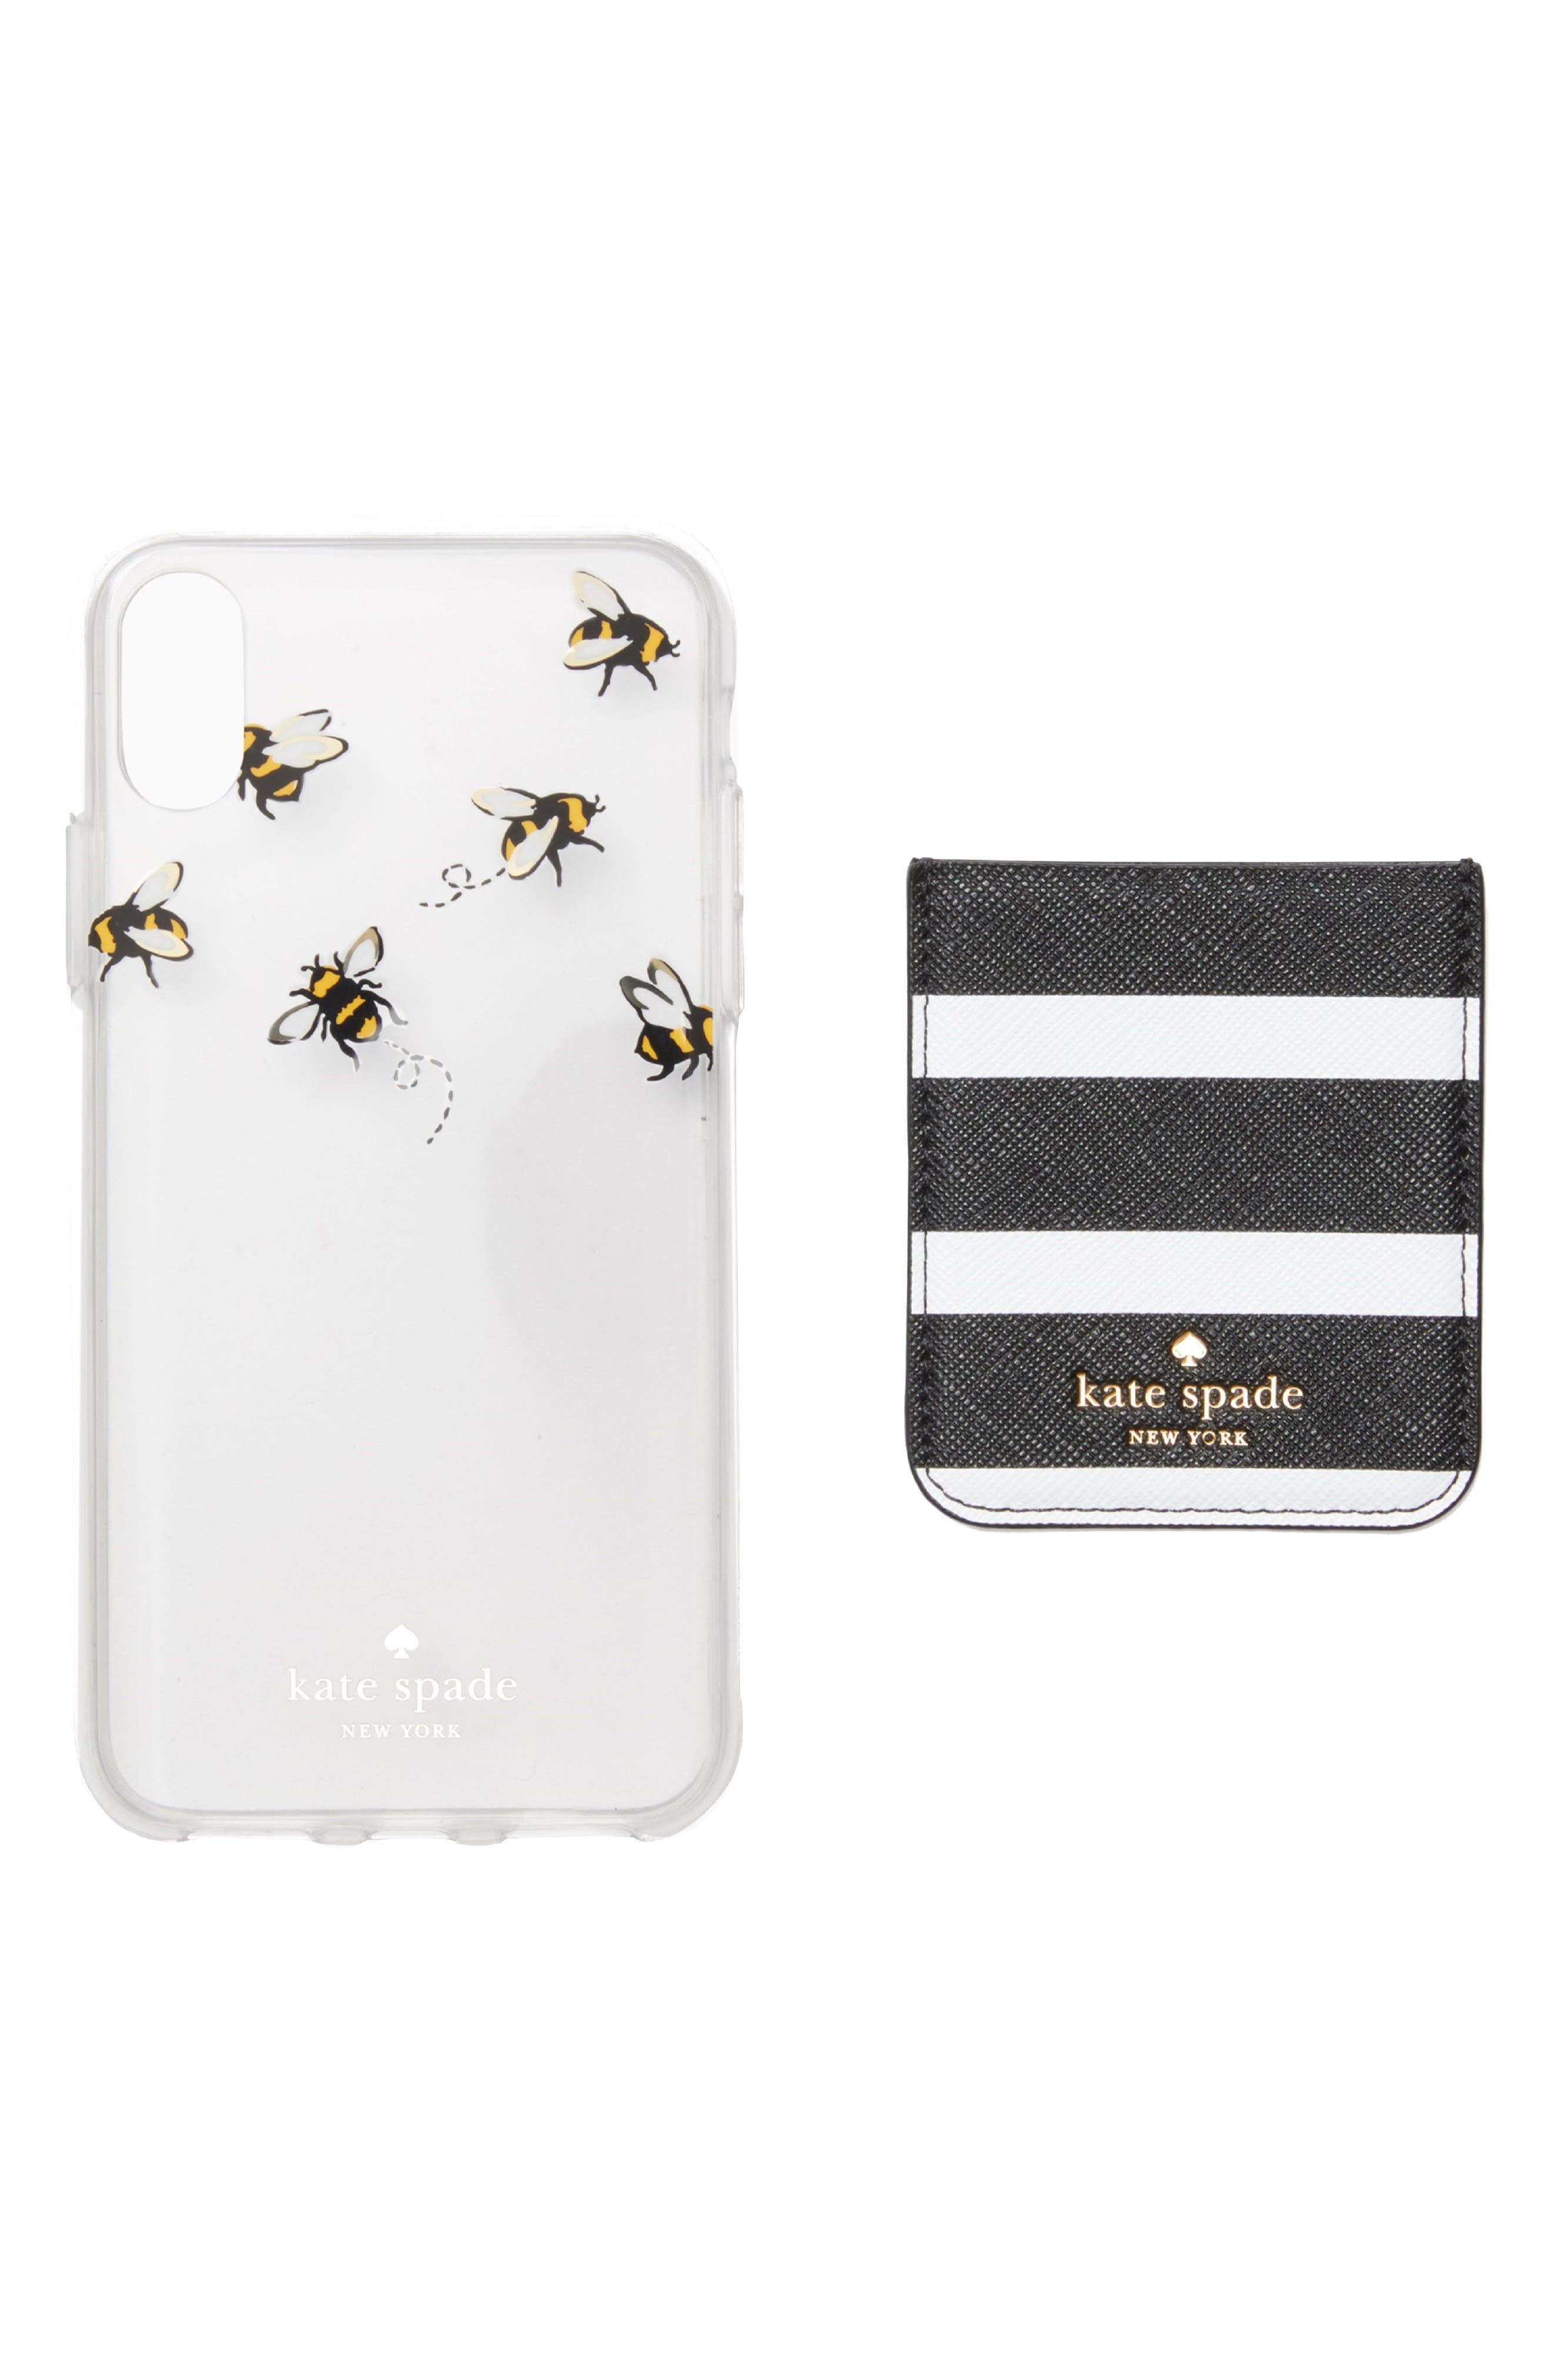 stick to it iPhone X case & sticker pocket set,                             Main thumbnail 2, color,